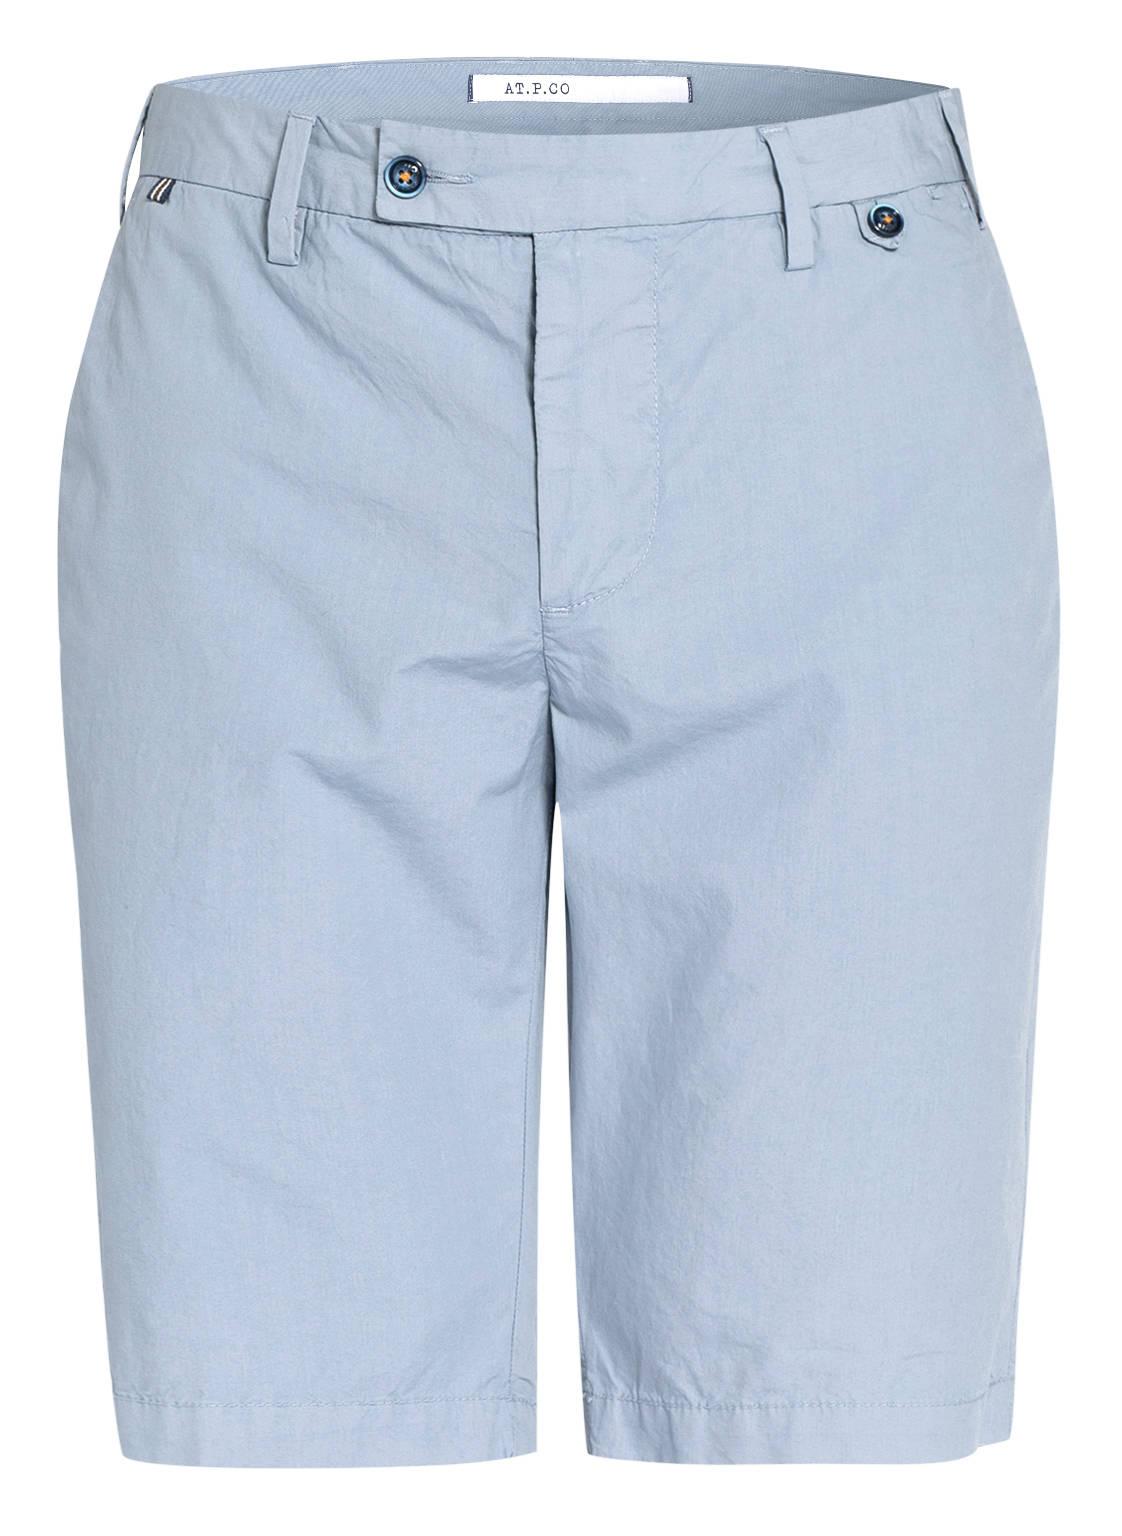 Image of At.P.Co Chino-Shorts Jack blau